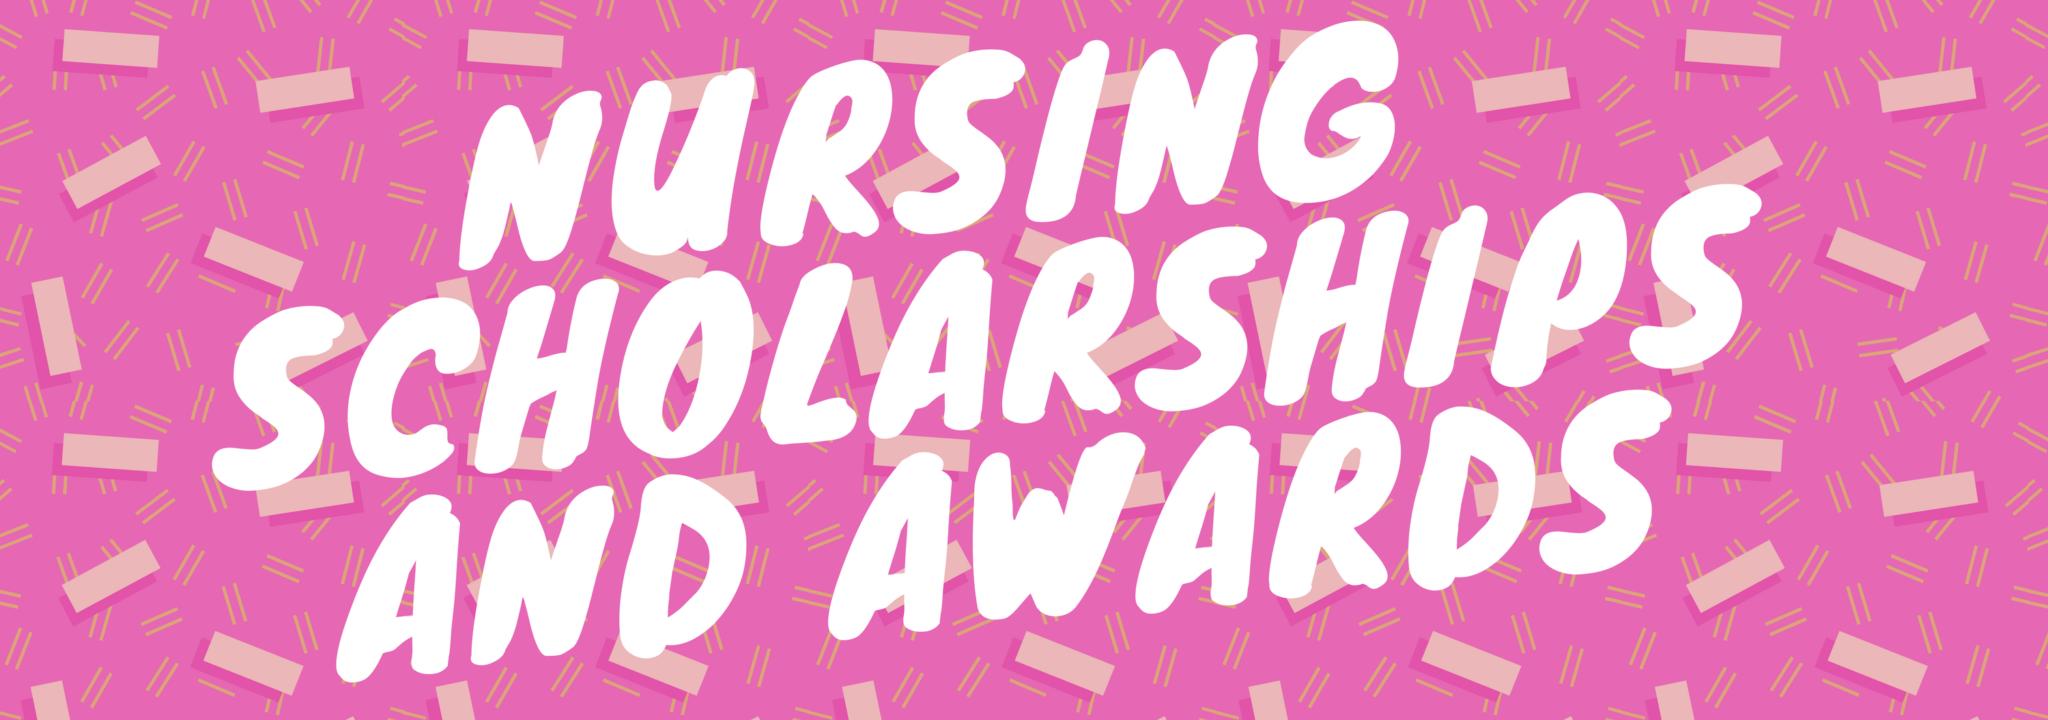 money, nursing, scholarships, nursing scholarships